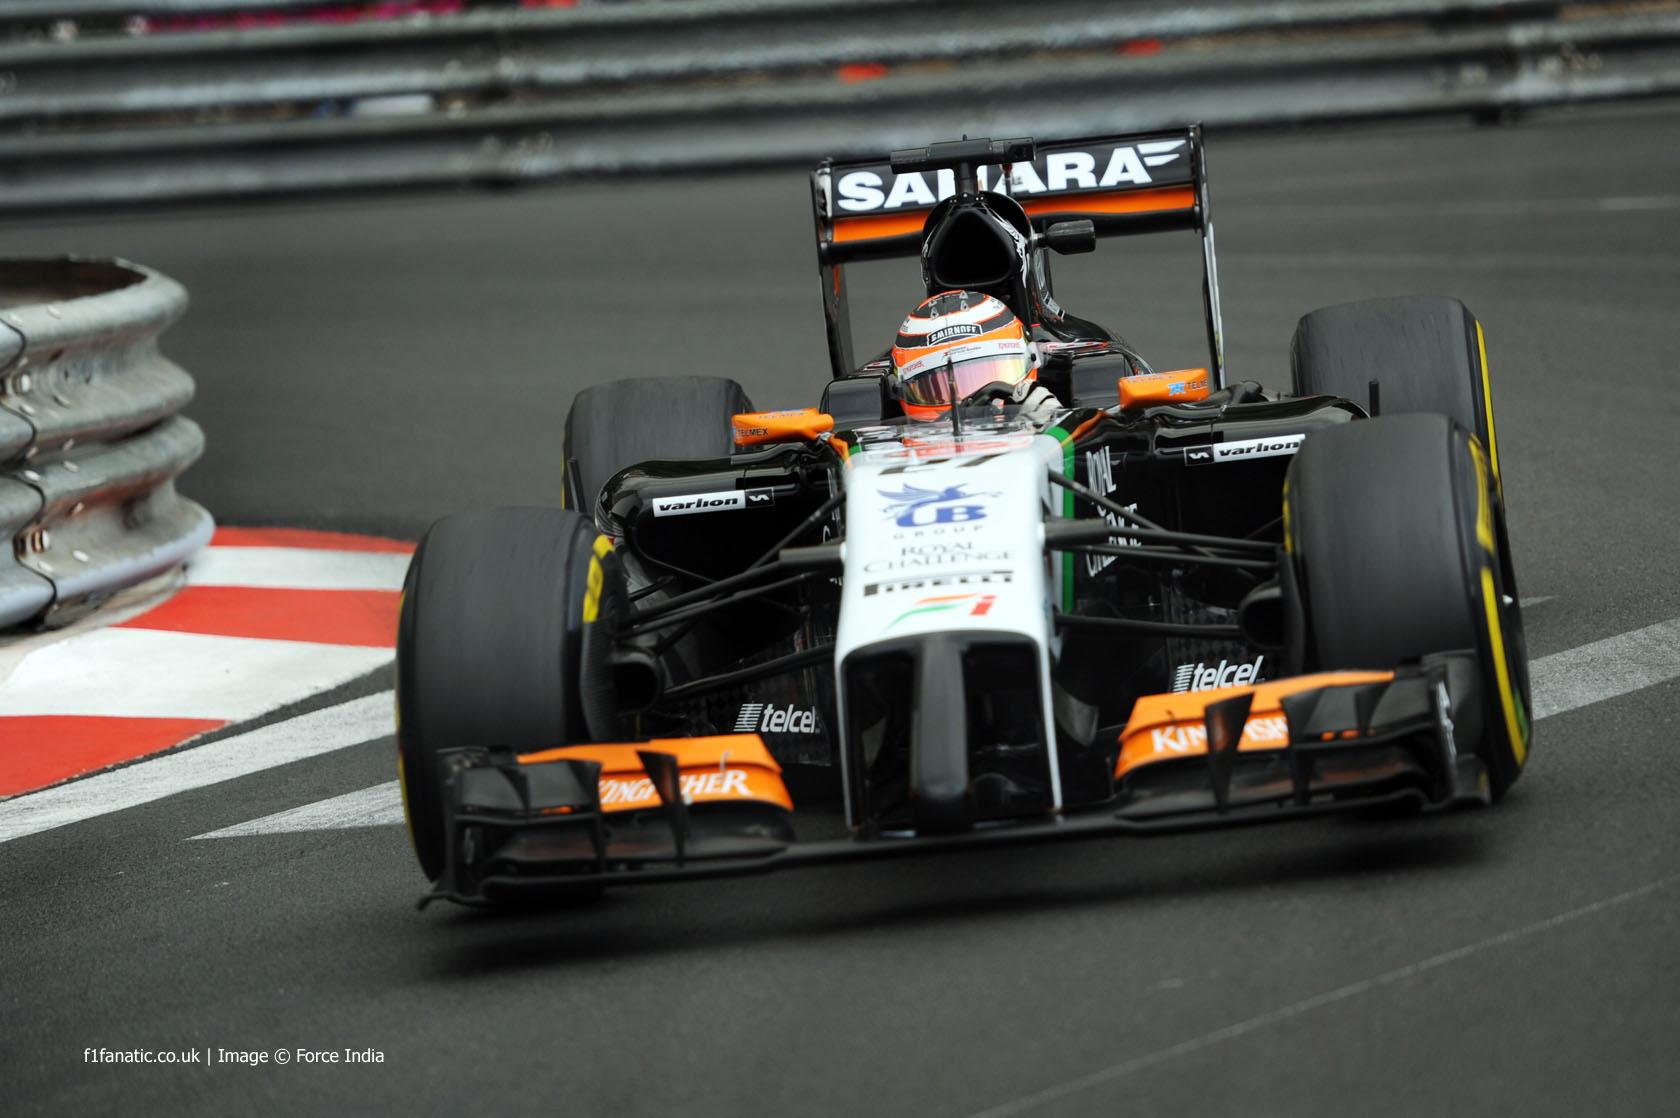 Nico Hulkenberg, Force India, Monte-Carlo, 2014